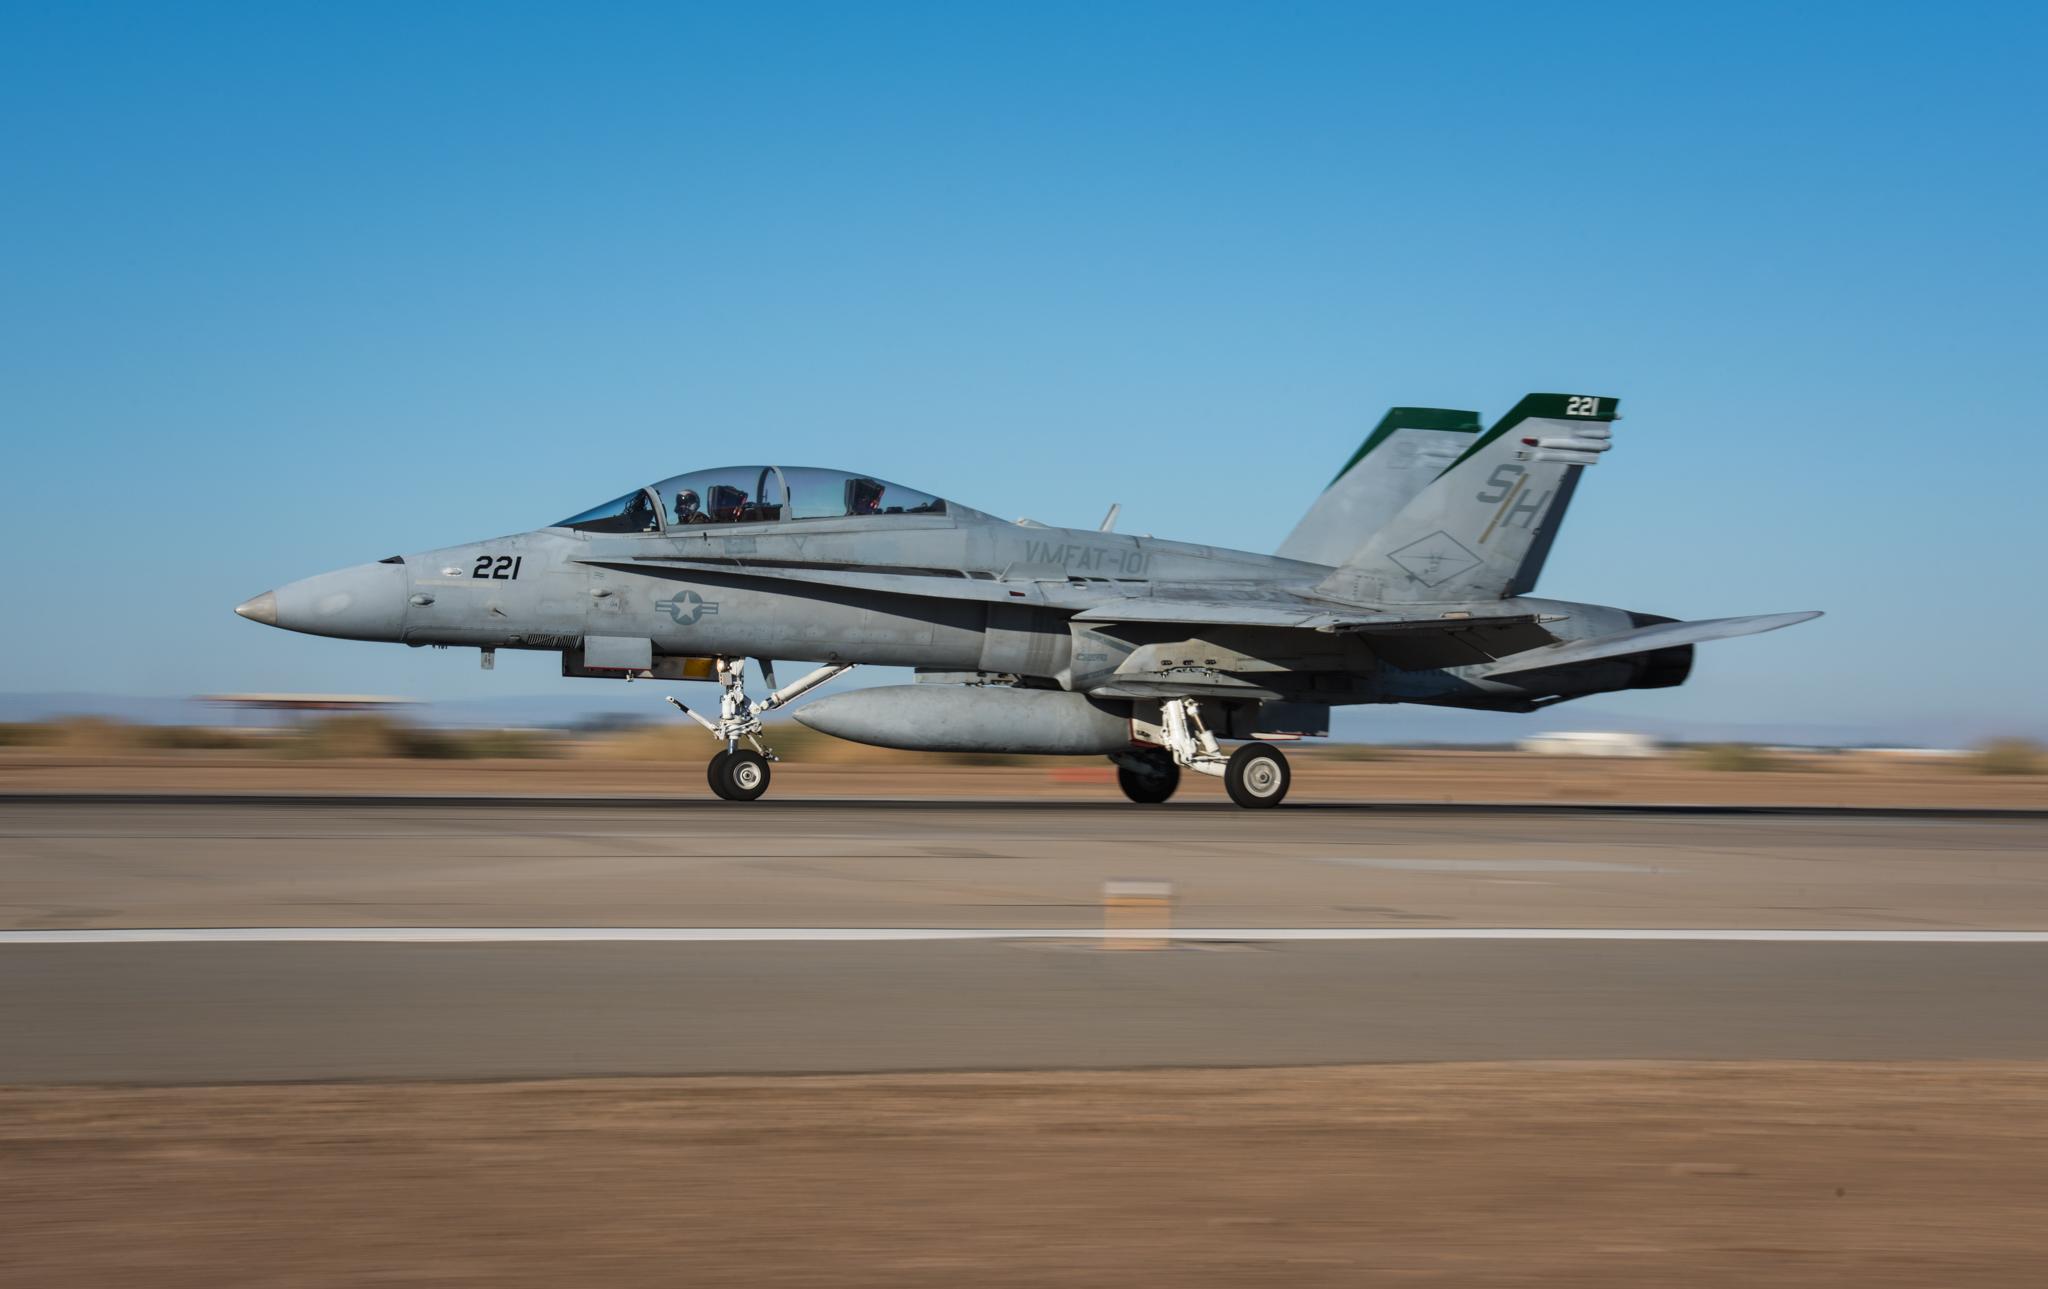 F/A-18 Hornet - Naval Air Facility El Centro, California